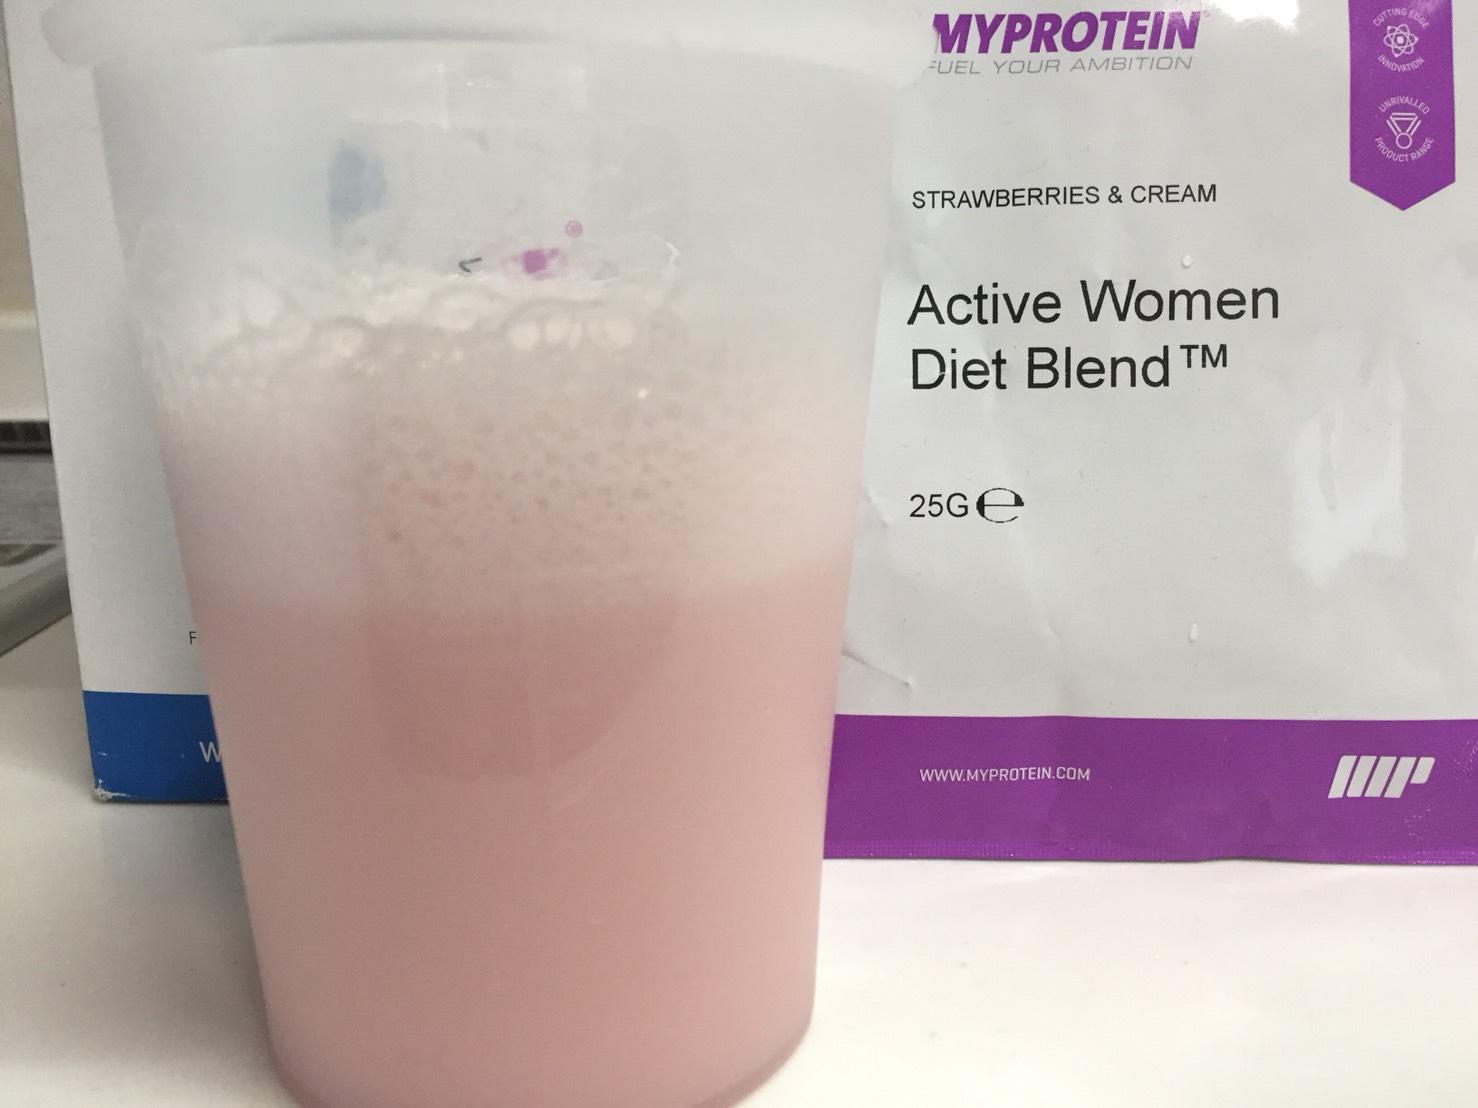 Active Women Diet Blend(アクティブウーマンダイエットブレンド)「STRAWBERRIES & CREAM(ストロベリー&クリーム味)」を横から撮影した様子